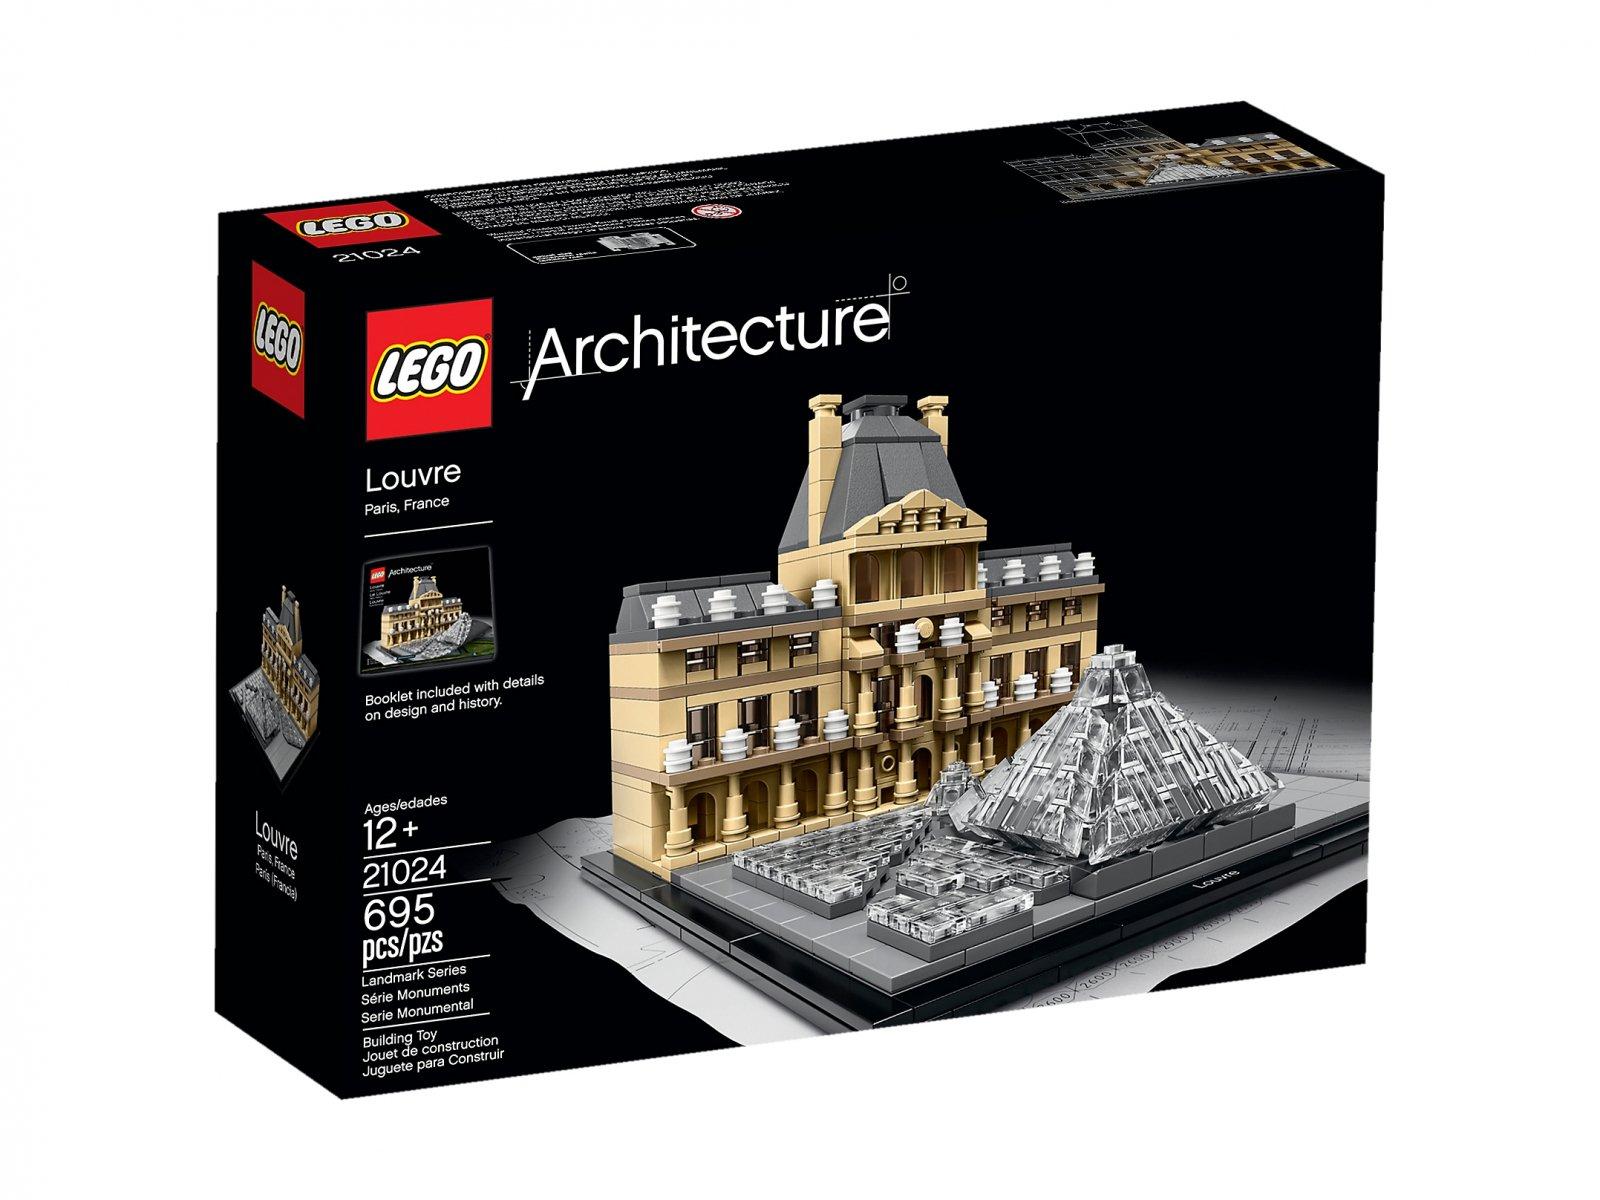 LEGO 21024 Architecture Luwr